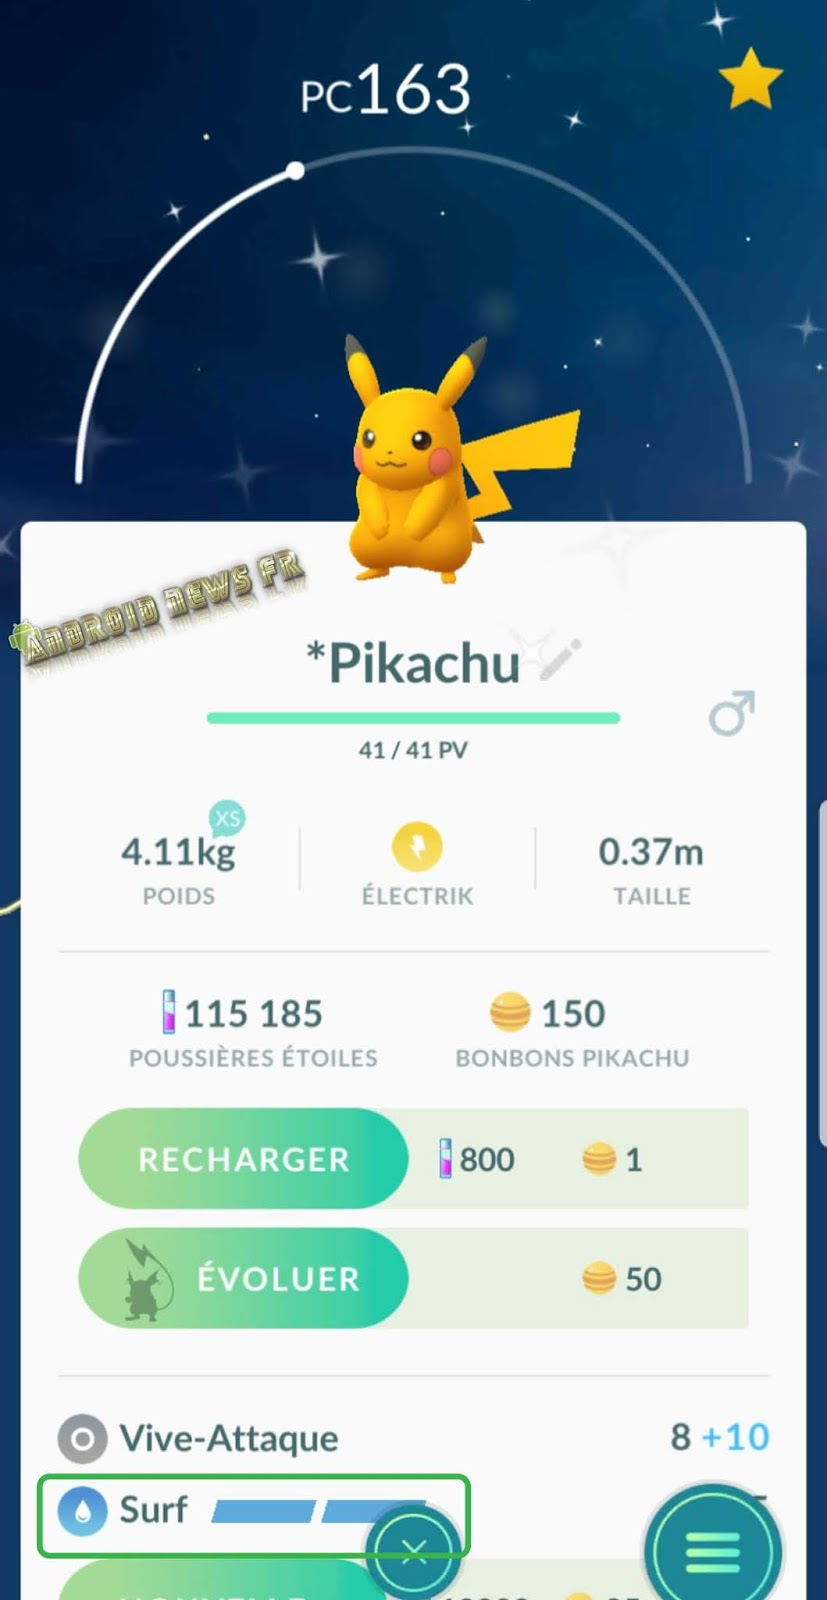 Pikachu, shiny, legacy, Surf